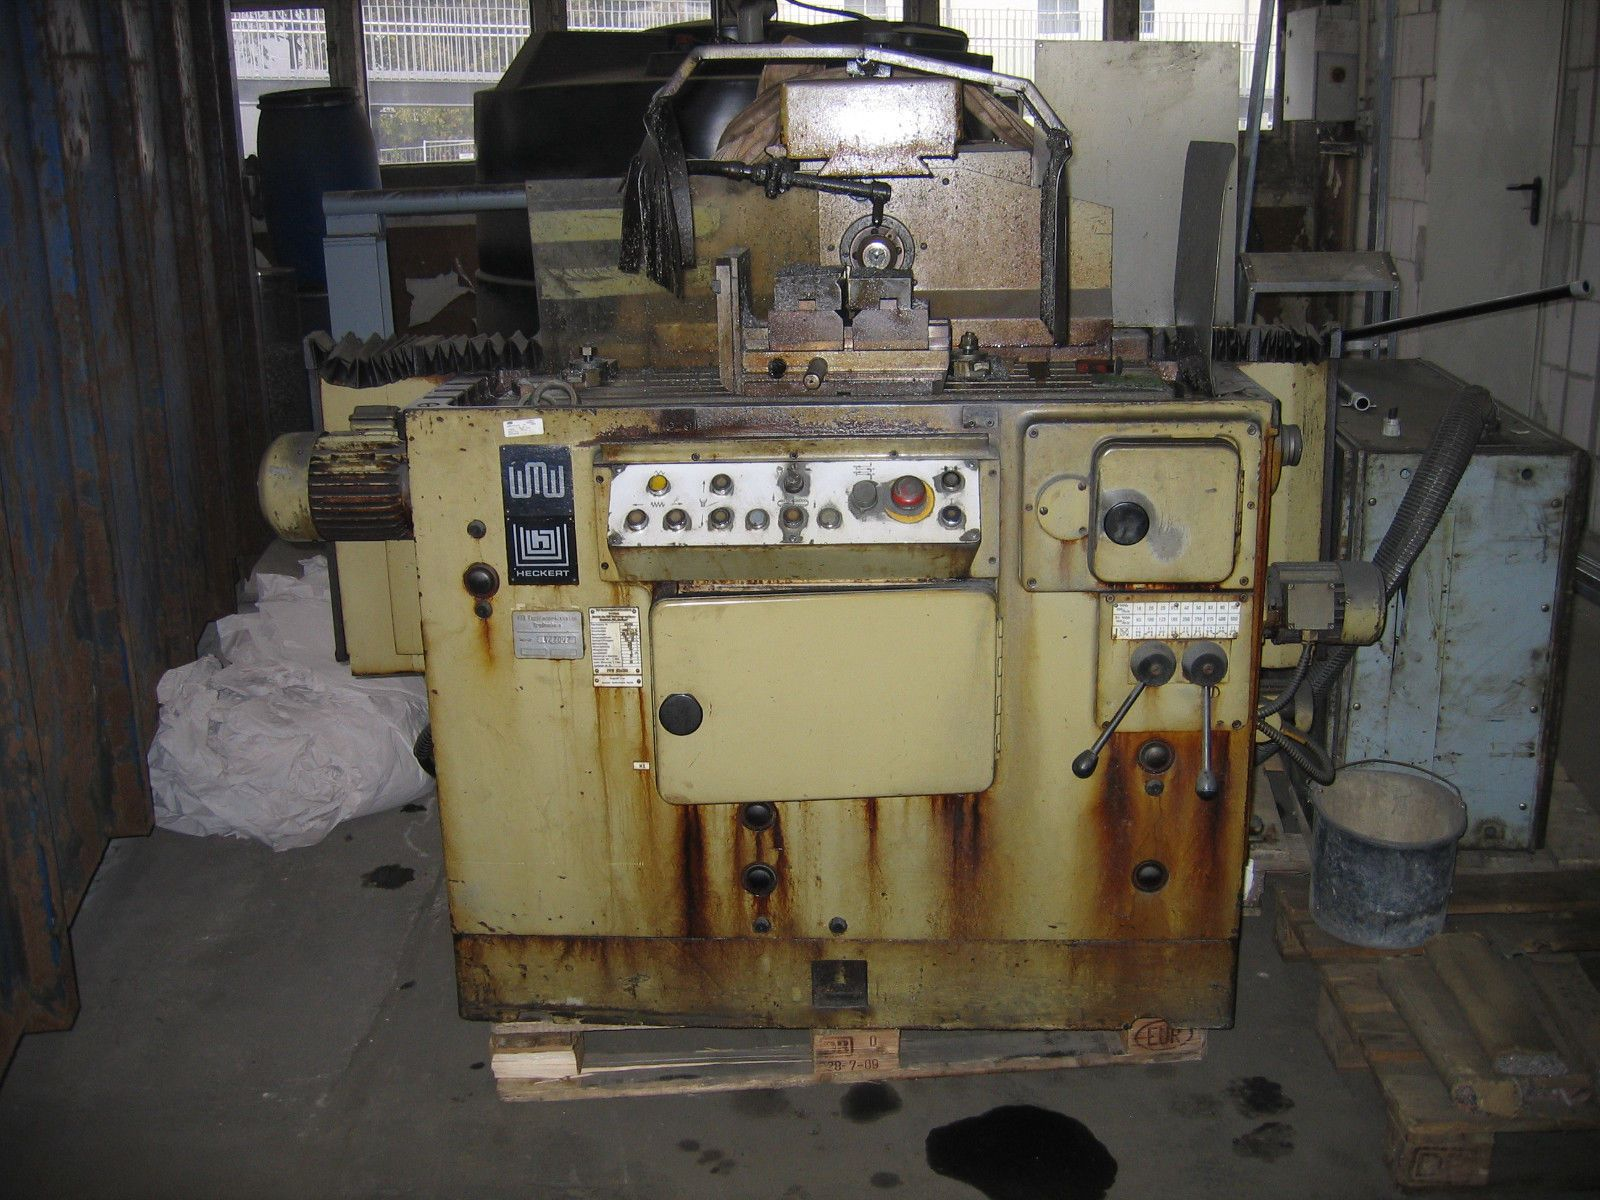 Fräsmaschine, Nutenfräsmaschine, WMW, FNW 32 x 500